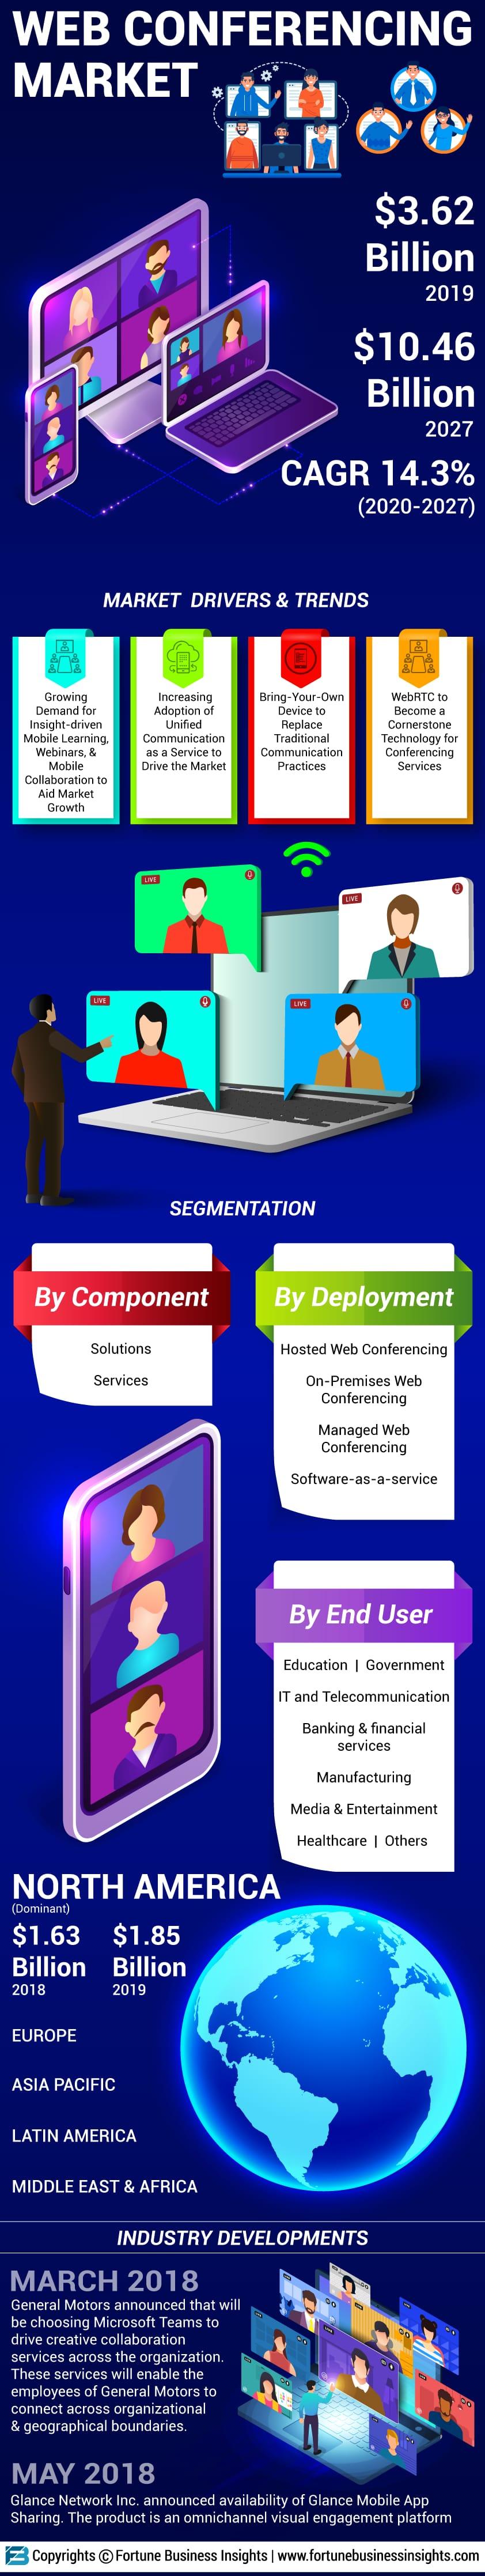 Web Conference Software Market